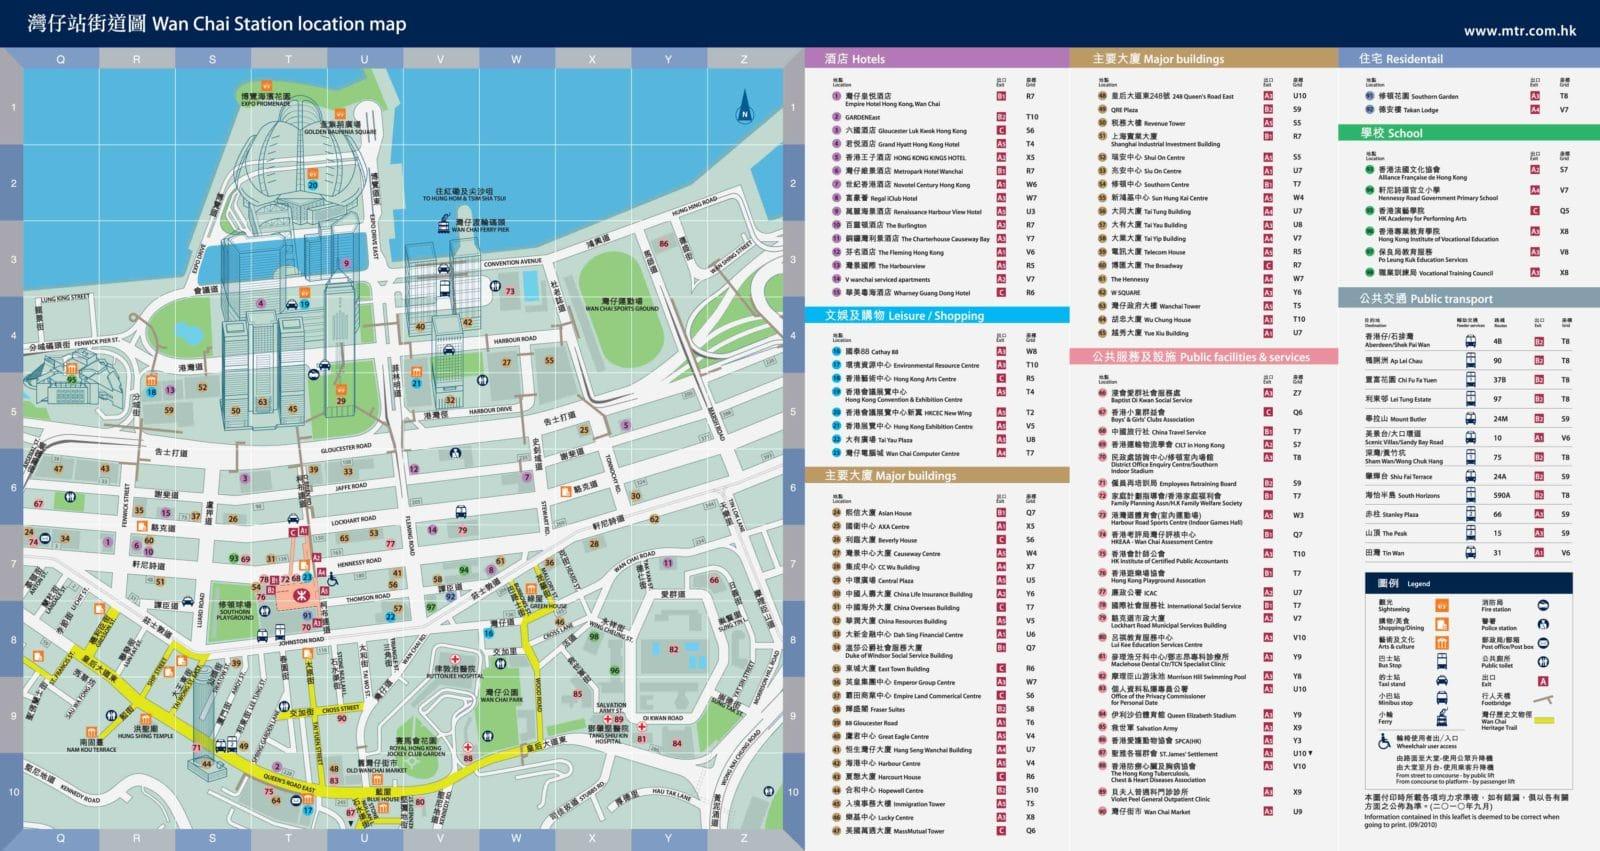 Hong Kong: Wan Chai MTR station area map 2012-2013